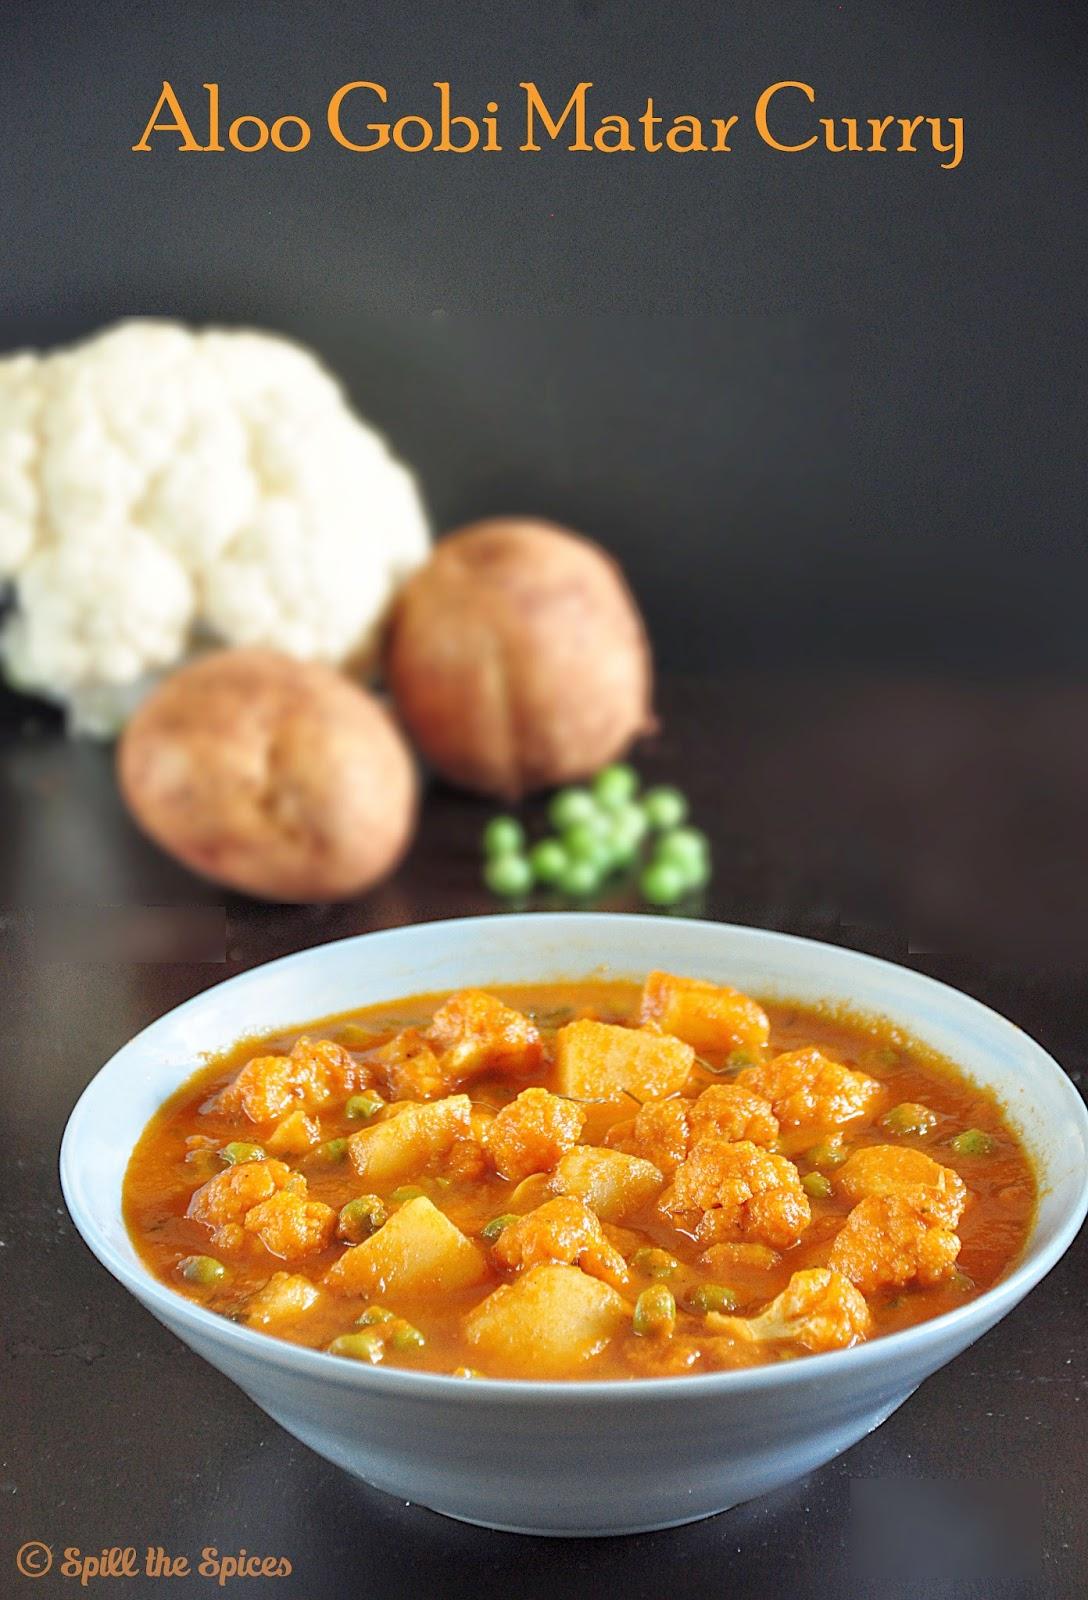 Aloo gobi matar potato cauliflower peas curry spill the spices aloo gobi matar potato cauliflower peas curry forumfinder Image collections